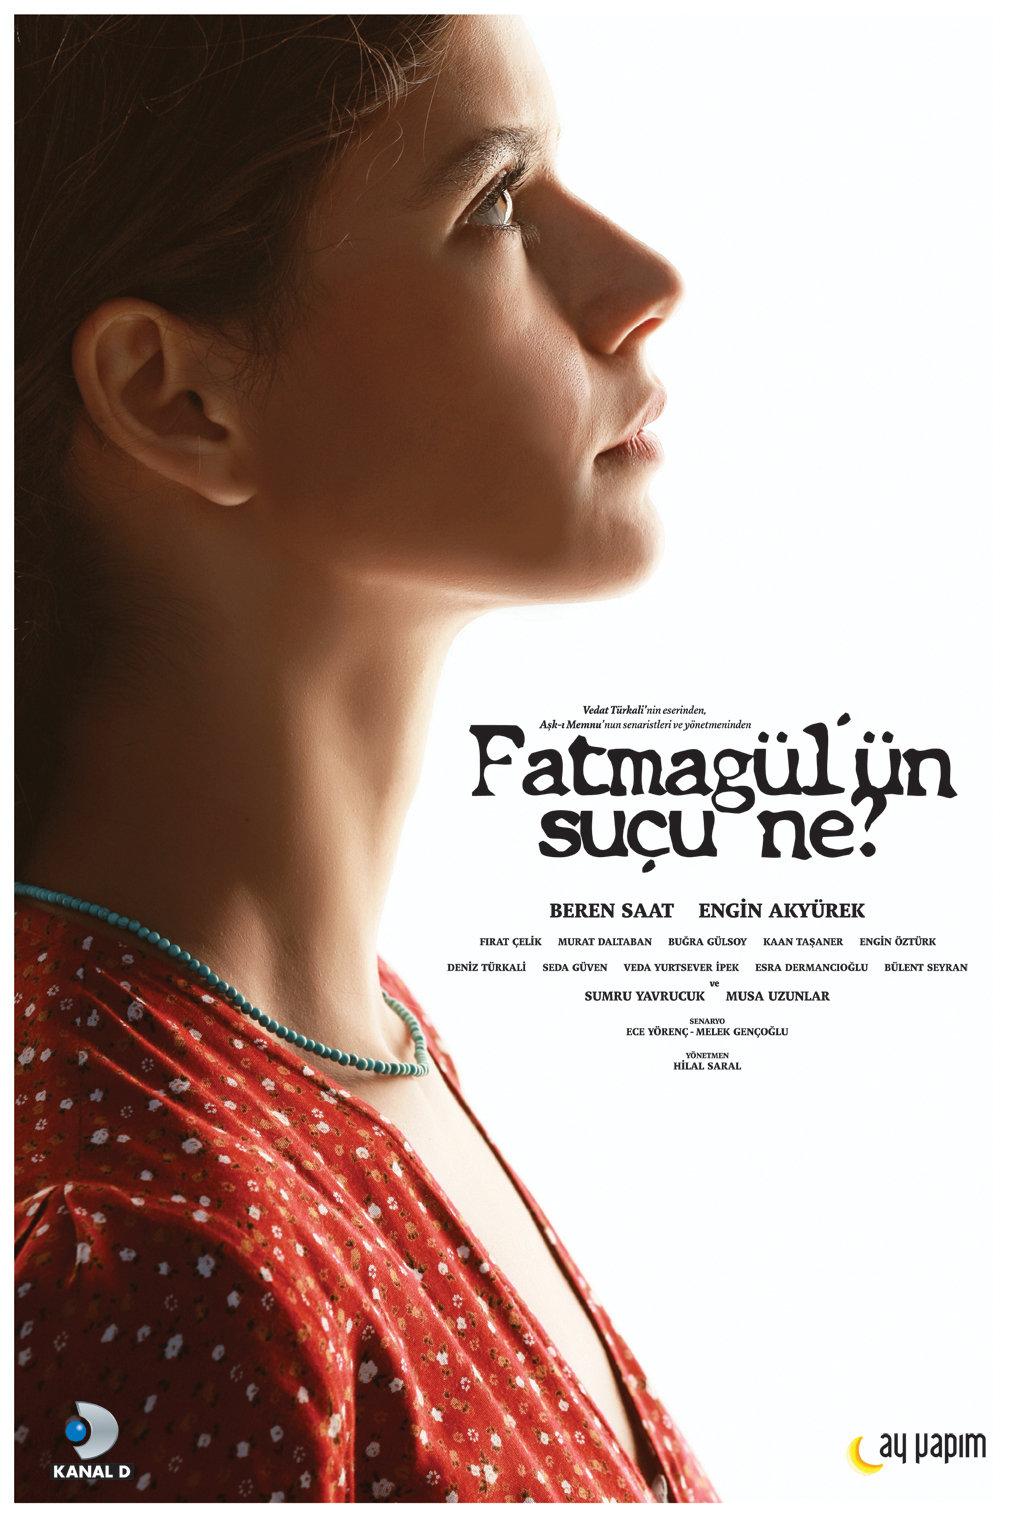 Fatmagül'ün Suçu Ne? (TV Series 2010–2012) - IMDb